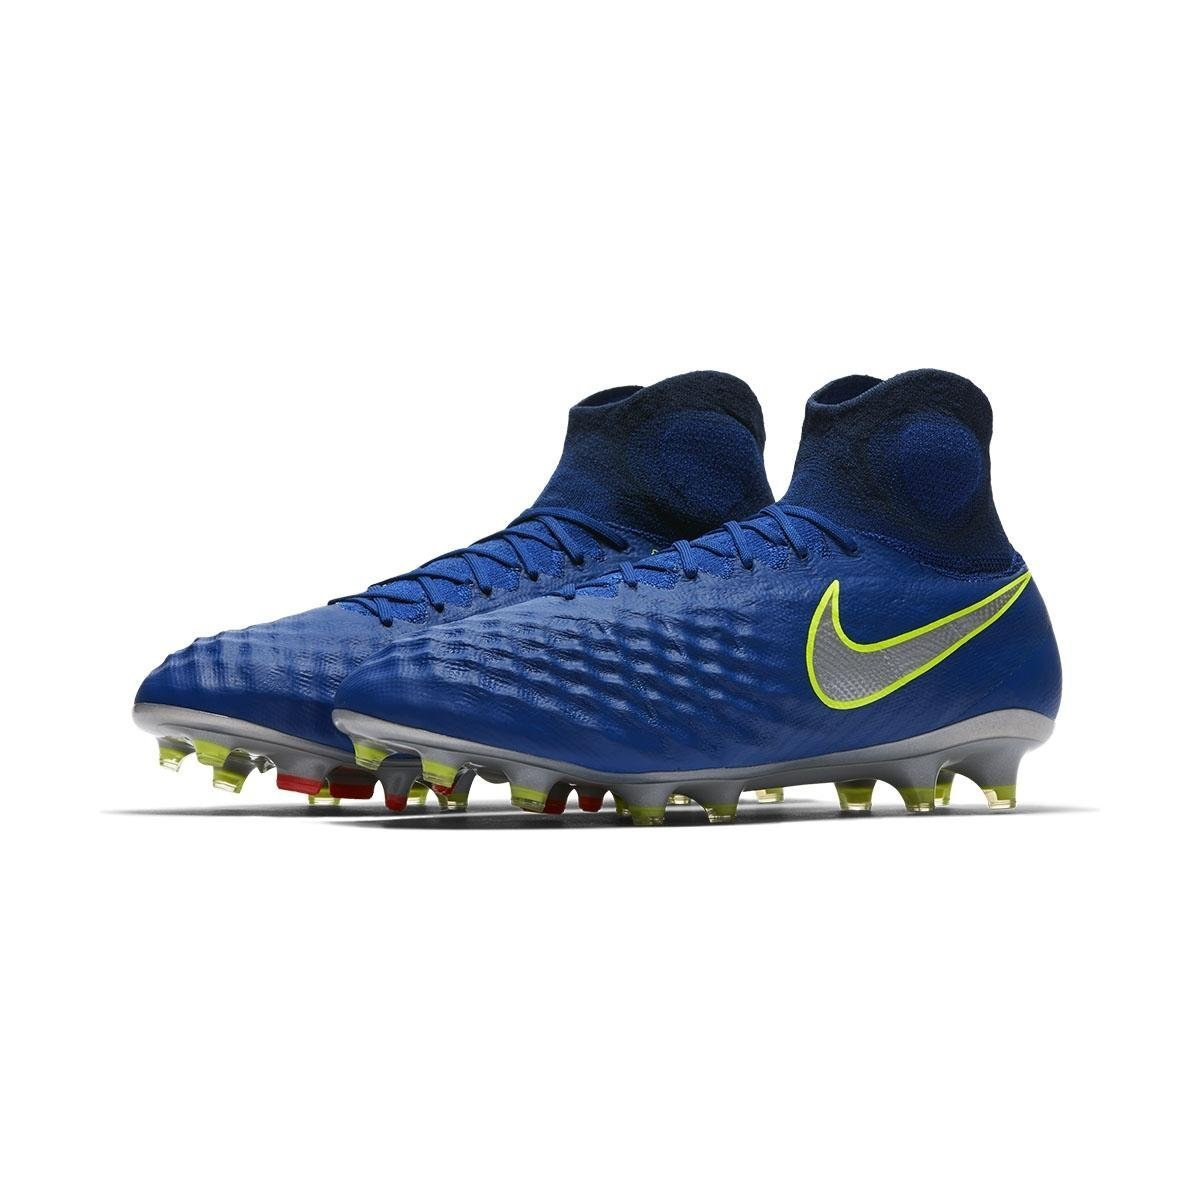 844595-409 Men's Nike Magista Obra II (FG)